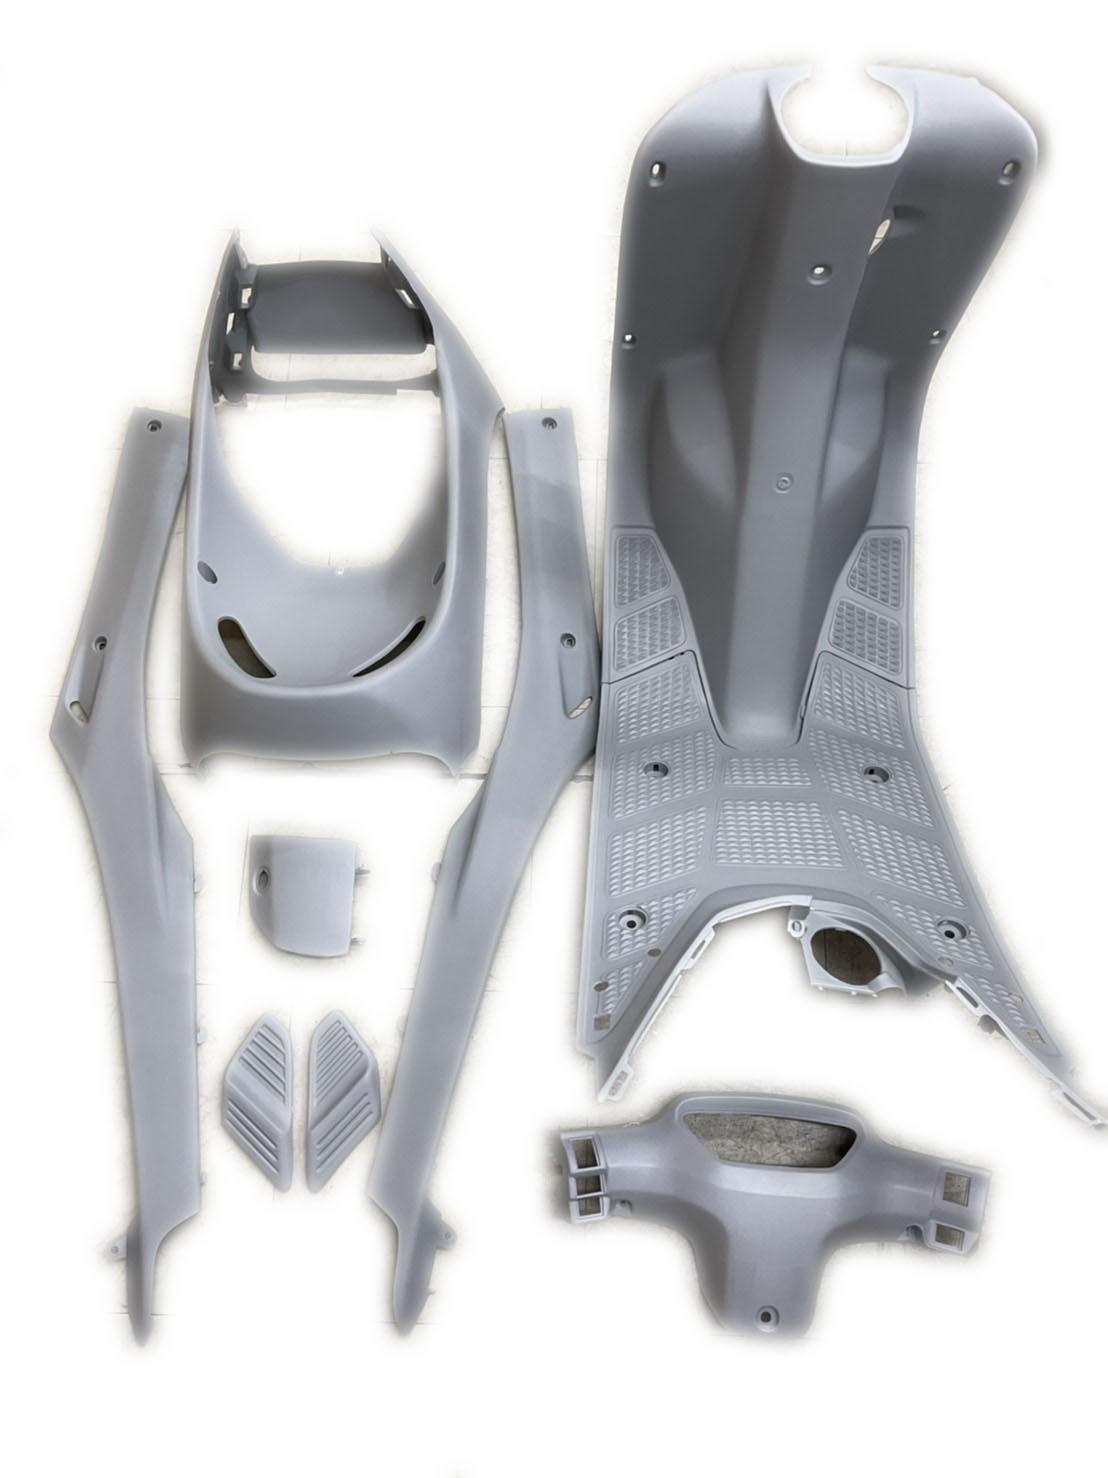 SYM-DIO-SP-EZ-斜板-內裝部品-素材淺灰